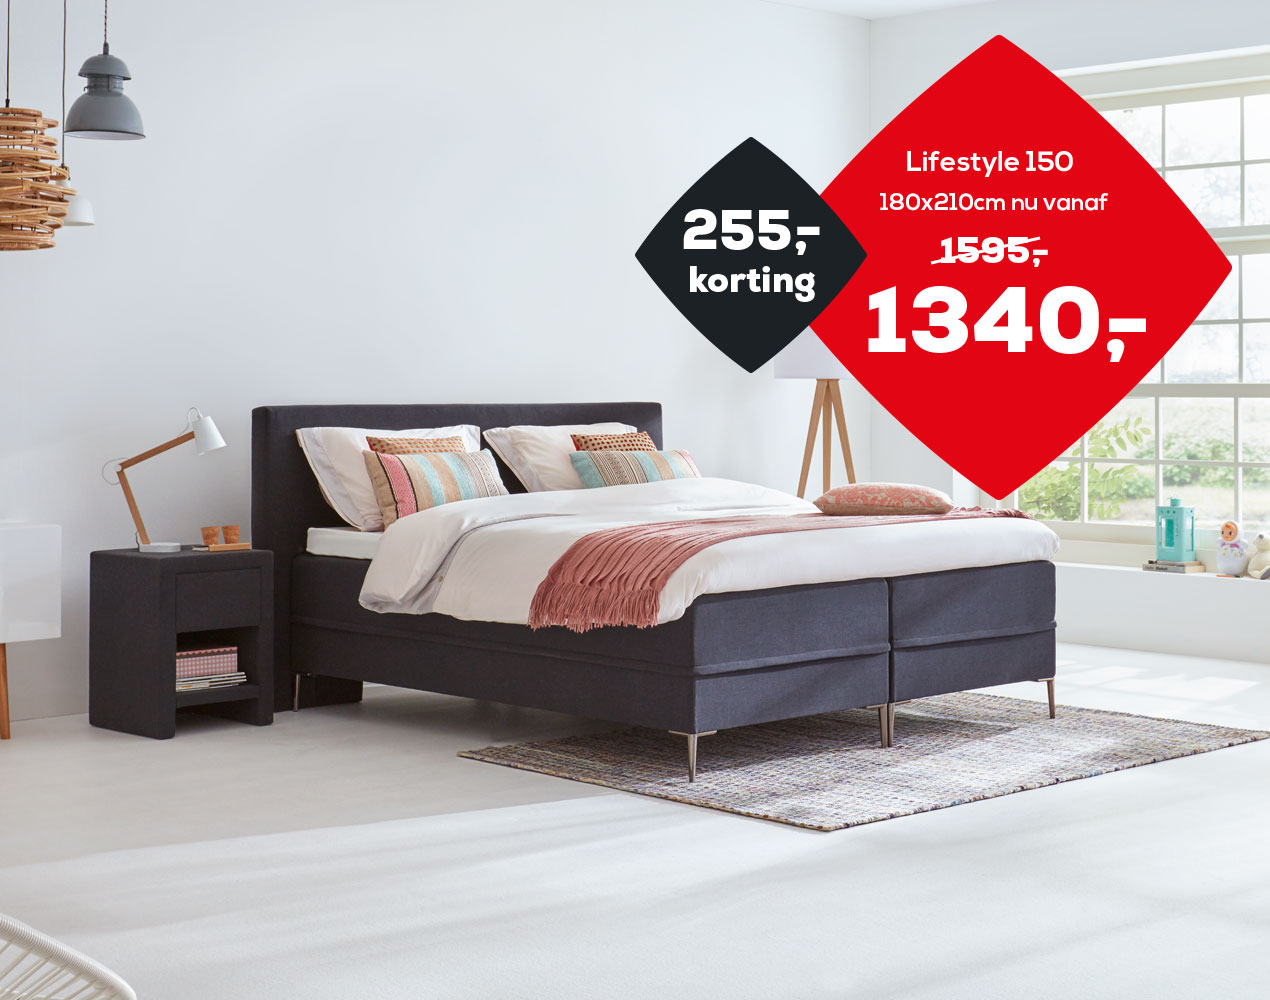 Lifestyle 150 | Swiss Sense